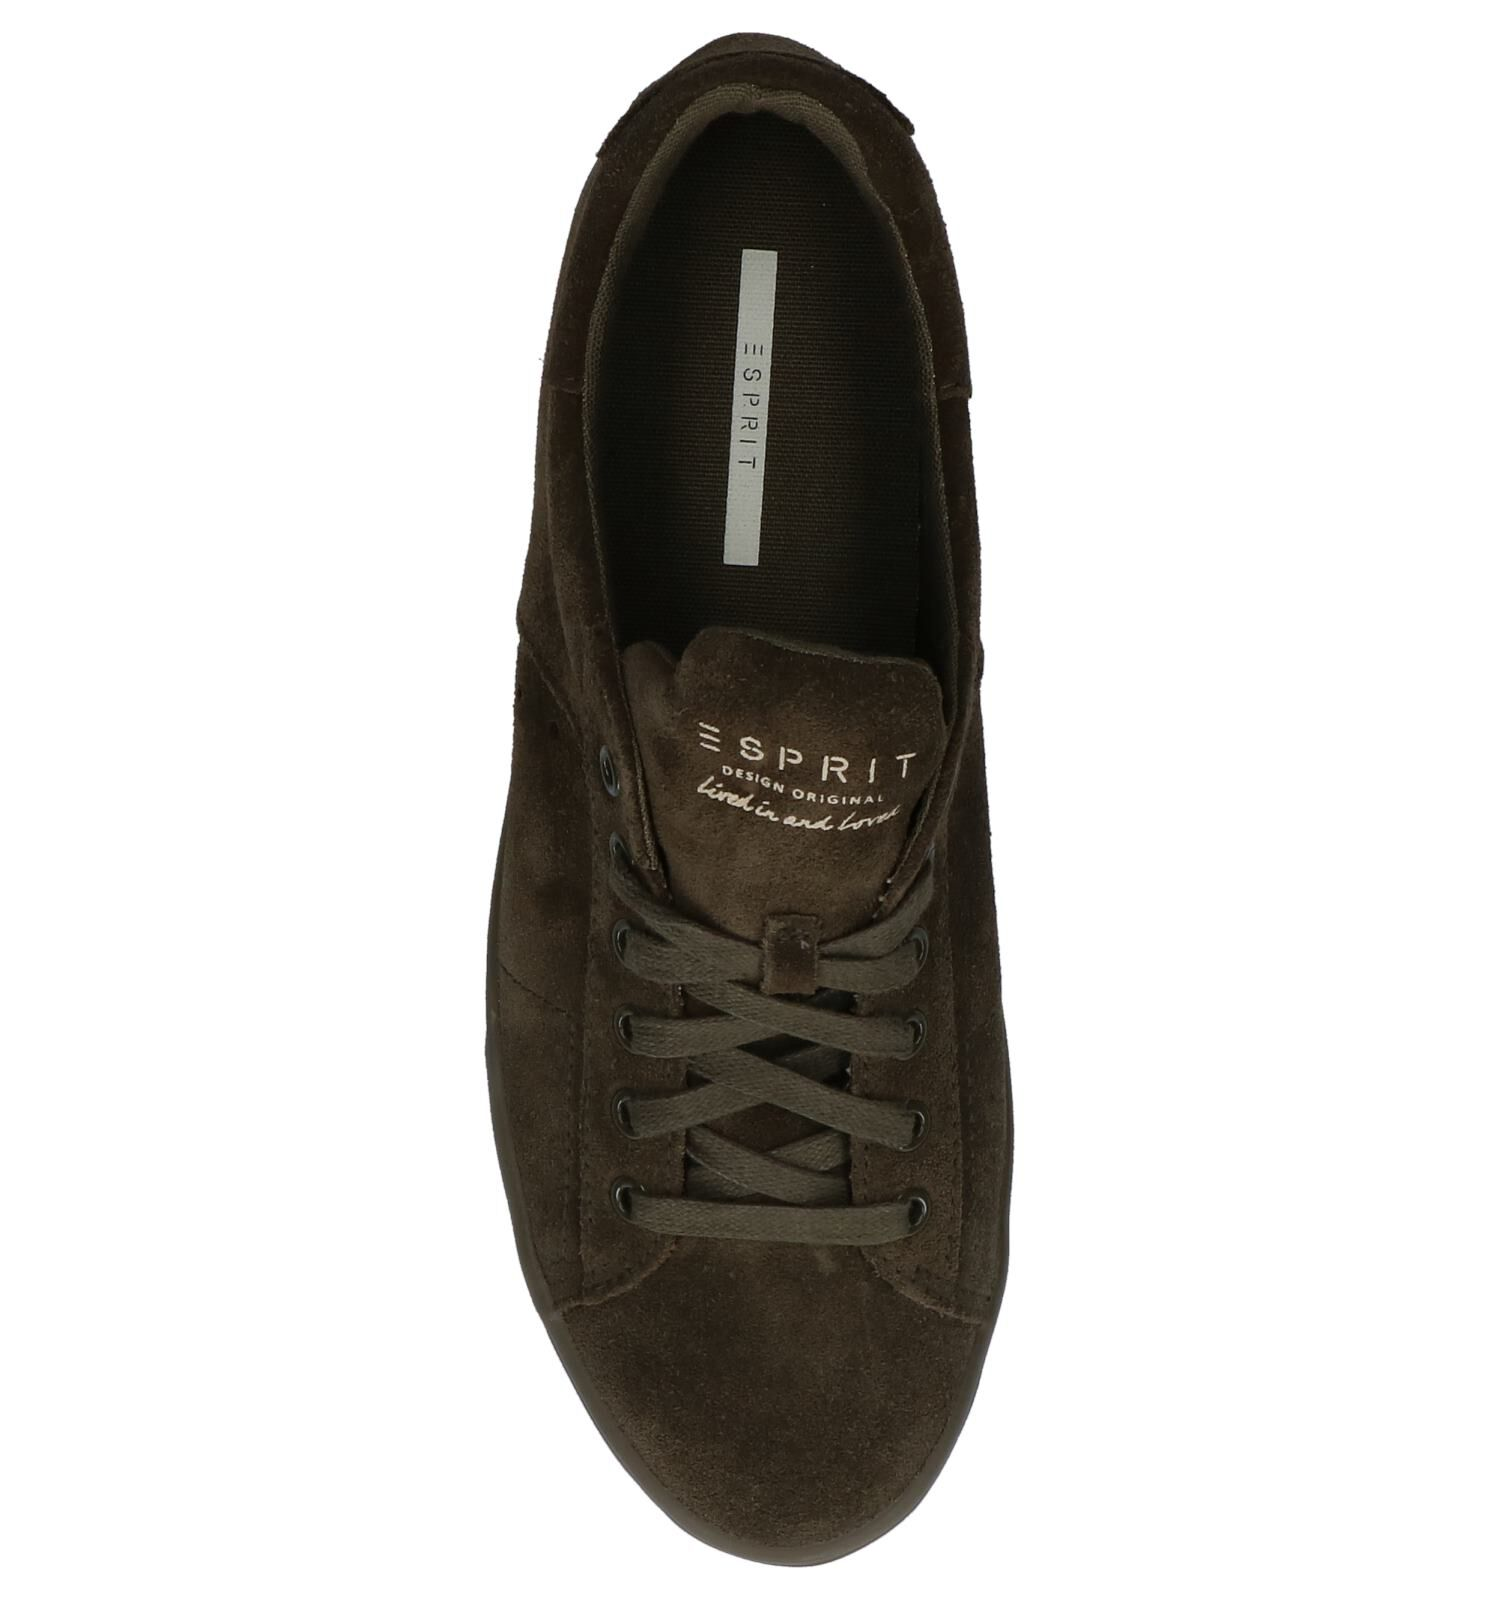 Esprit Sita Lace Up Kaki Geklede Sneakers